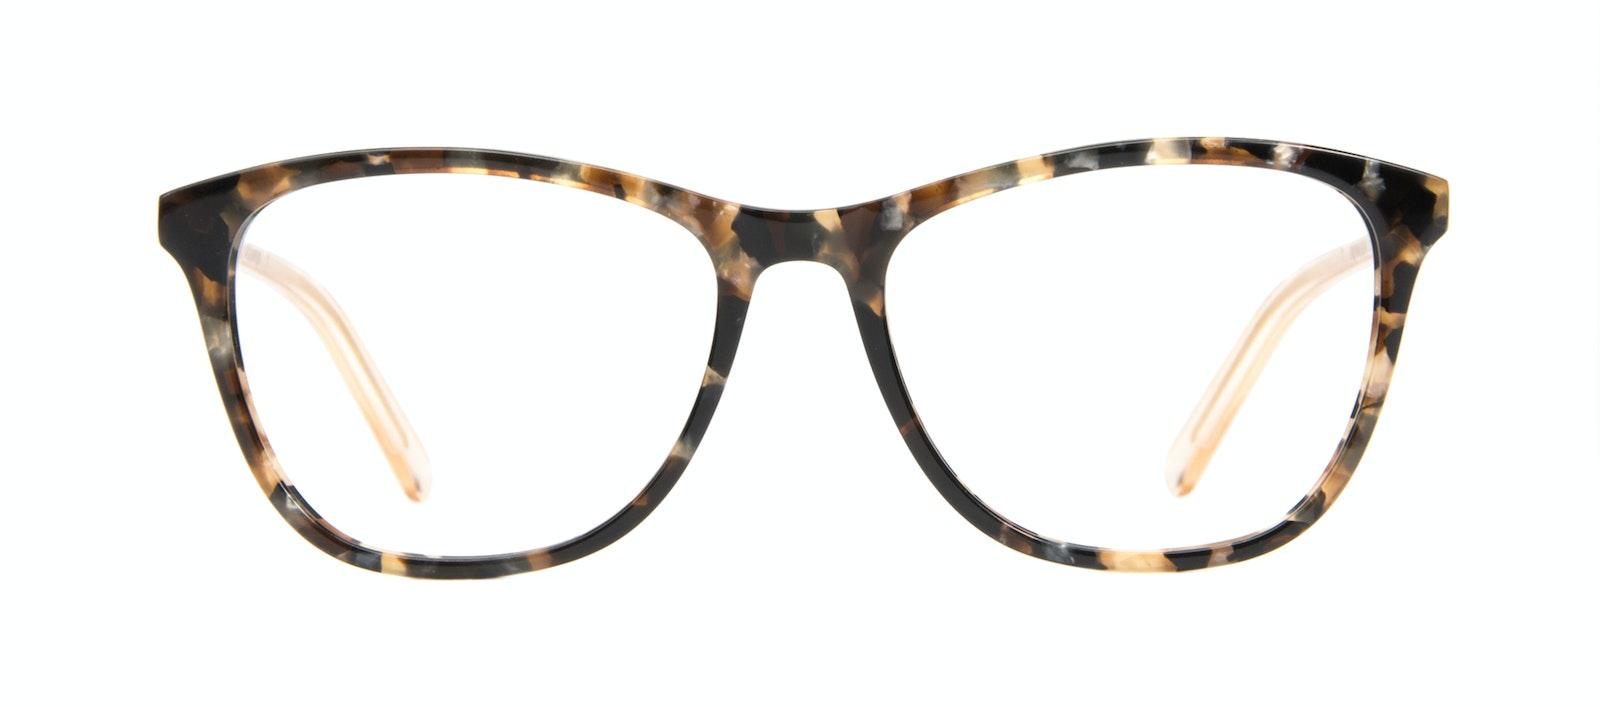 Affordable Fashion Glasses Rectangle Eyeglasses Women Folk Gold Flake Front